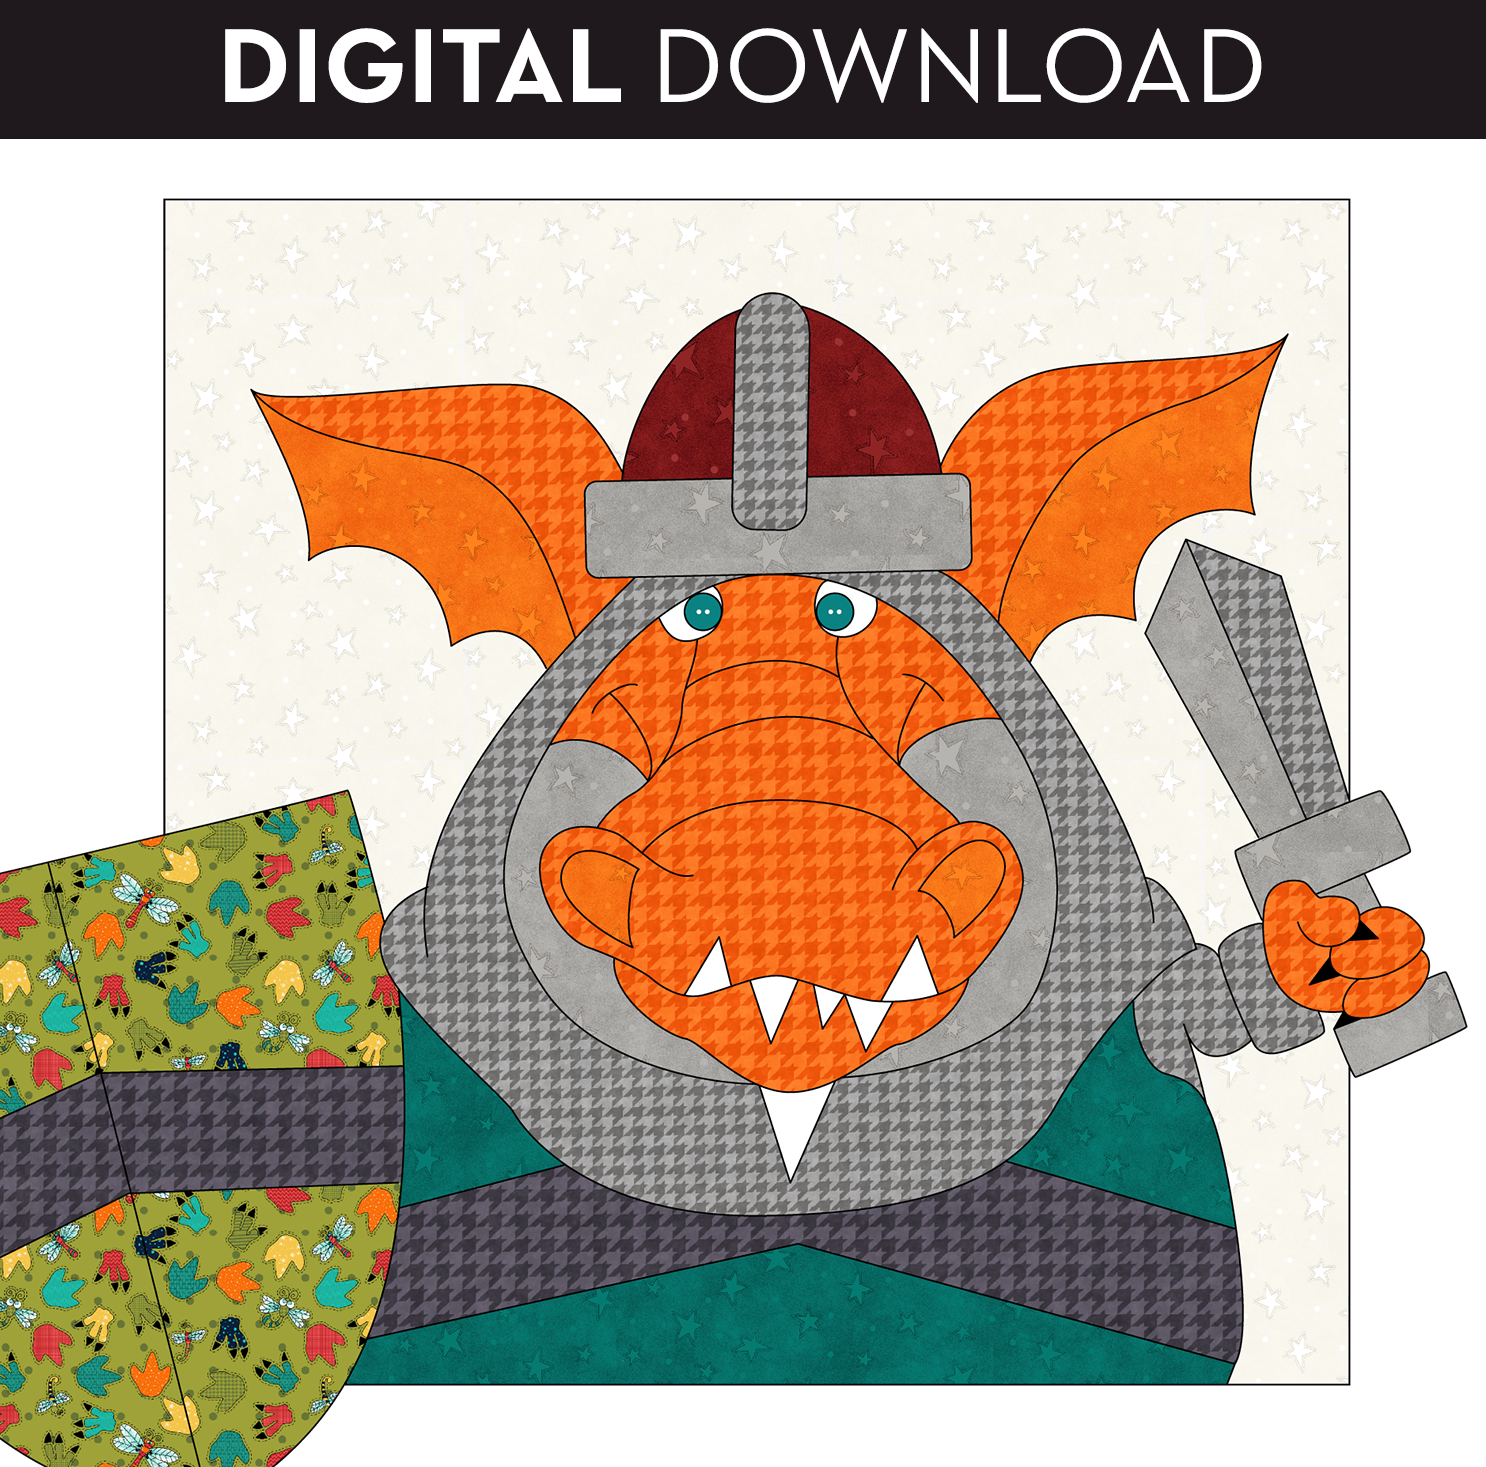 Knight Dragon Applique - Download